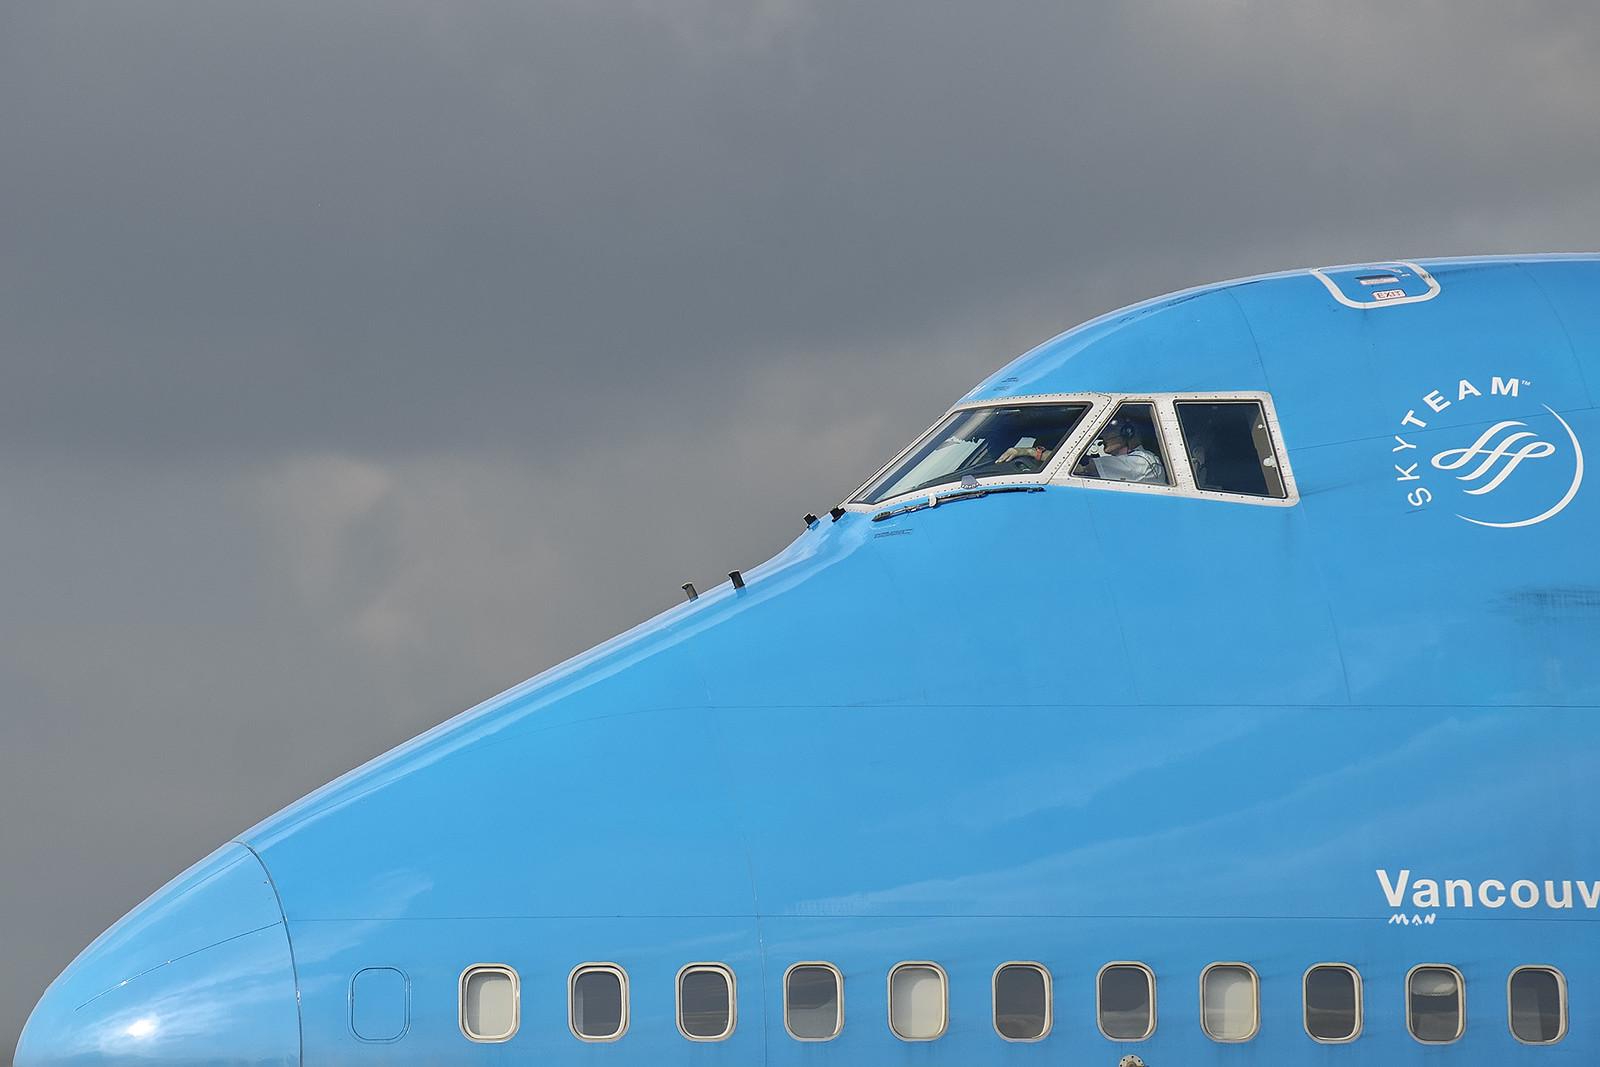 747 KLM Vancouver EHAM [Explore]